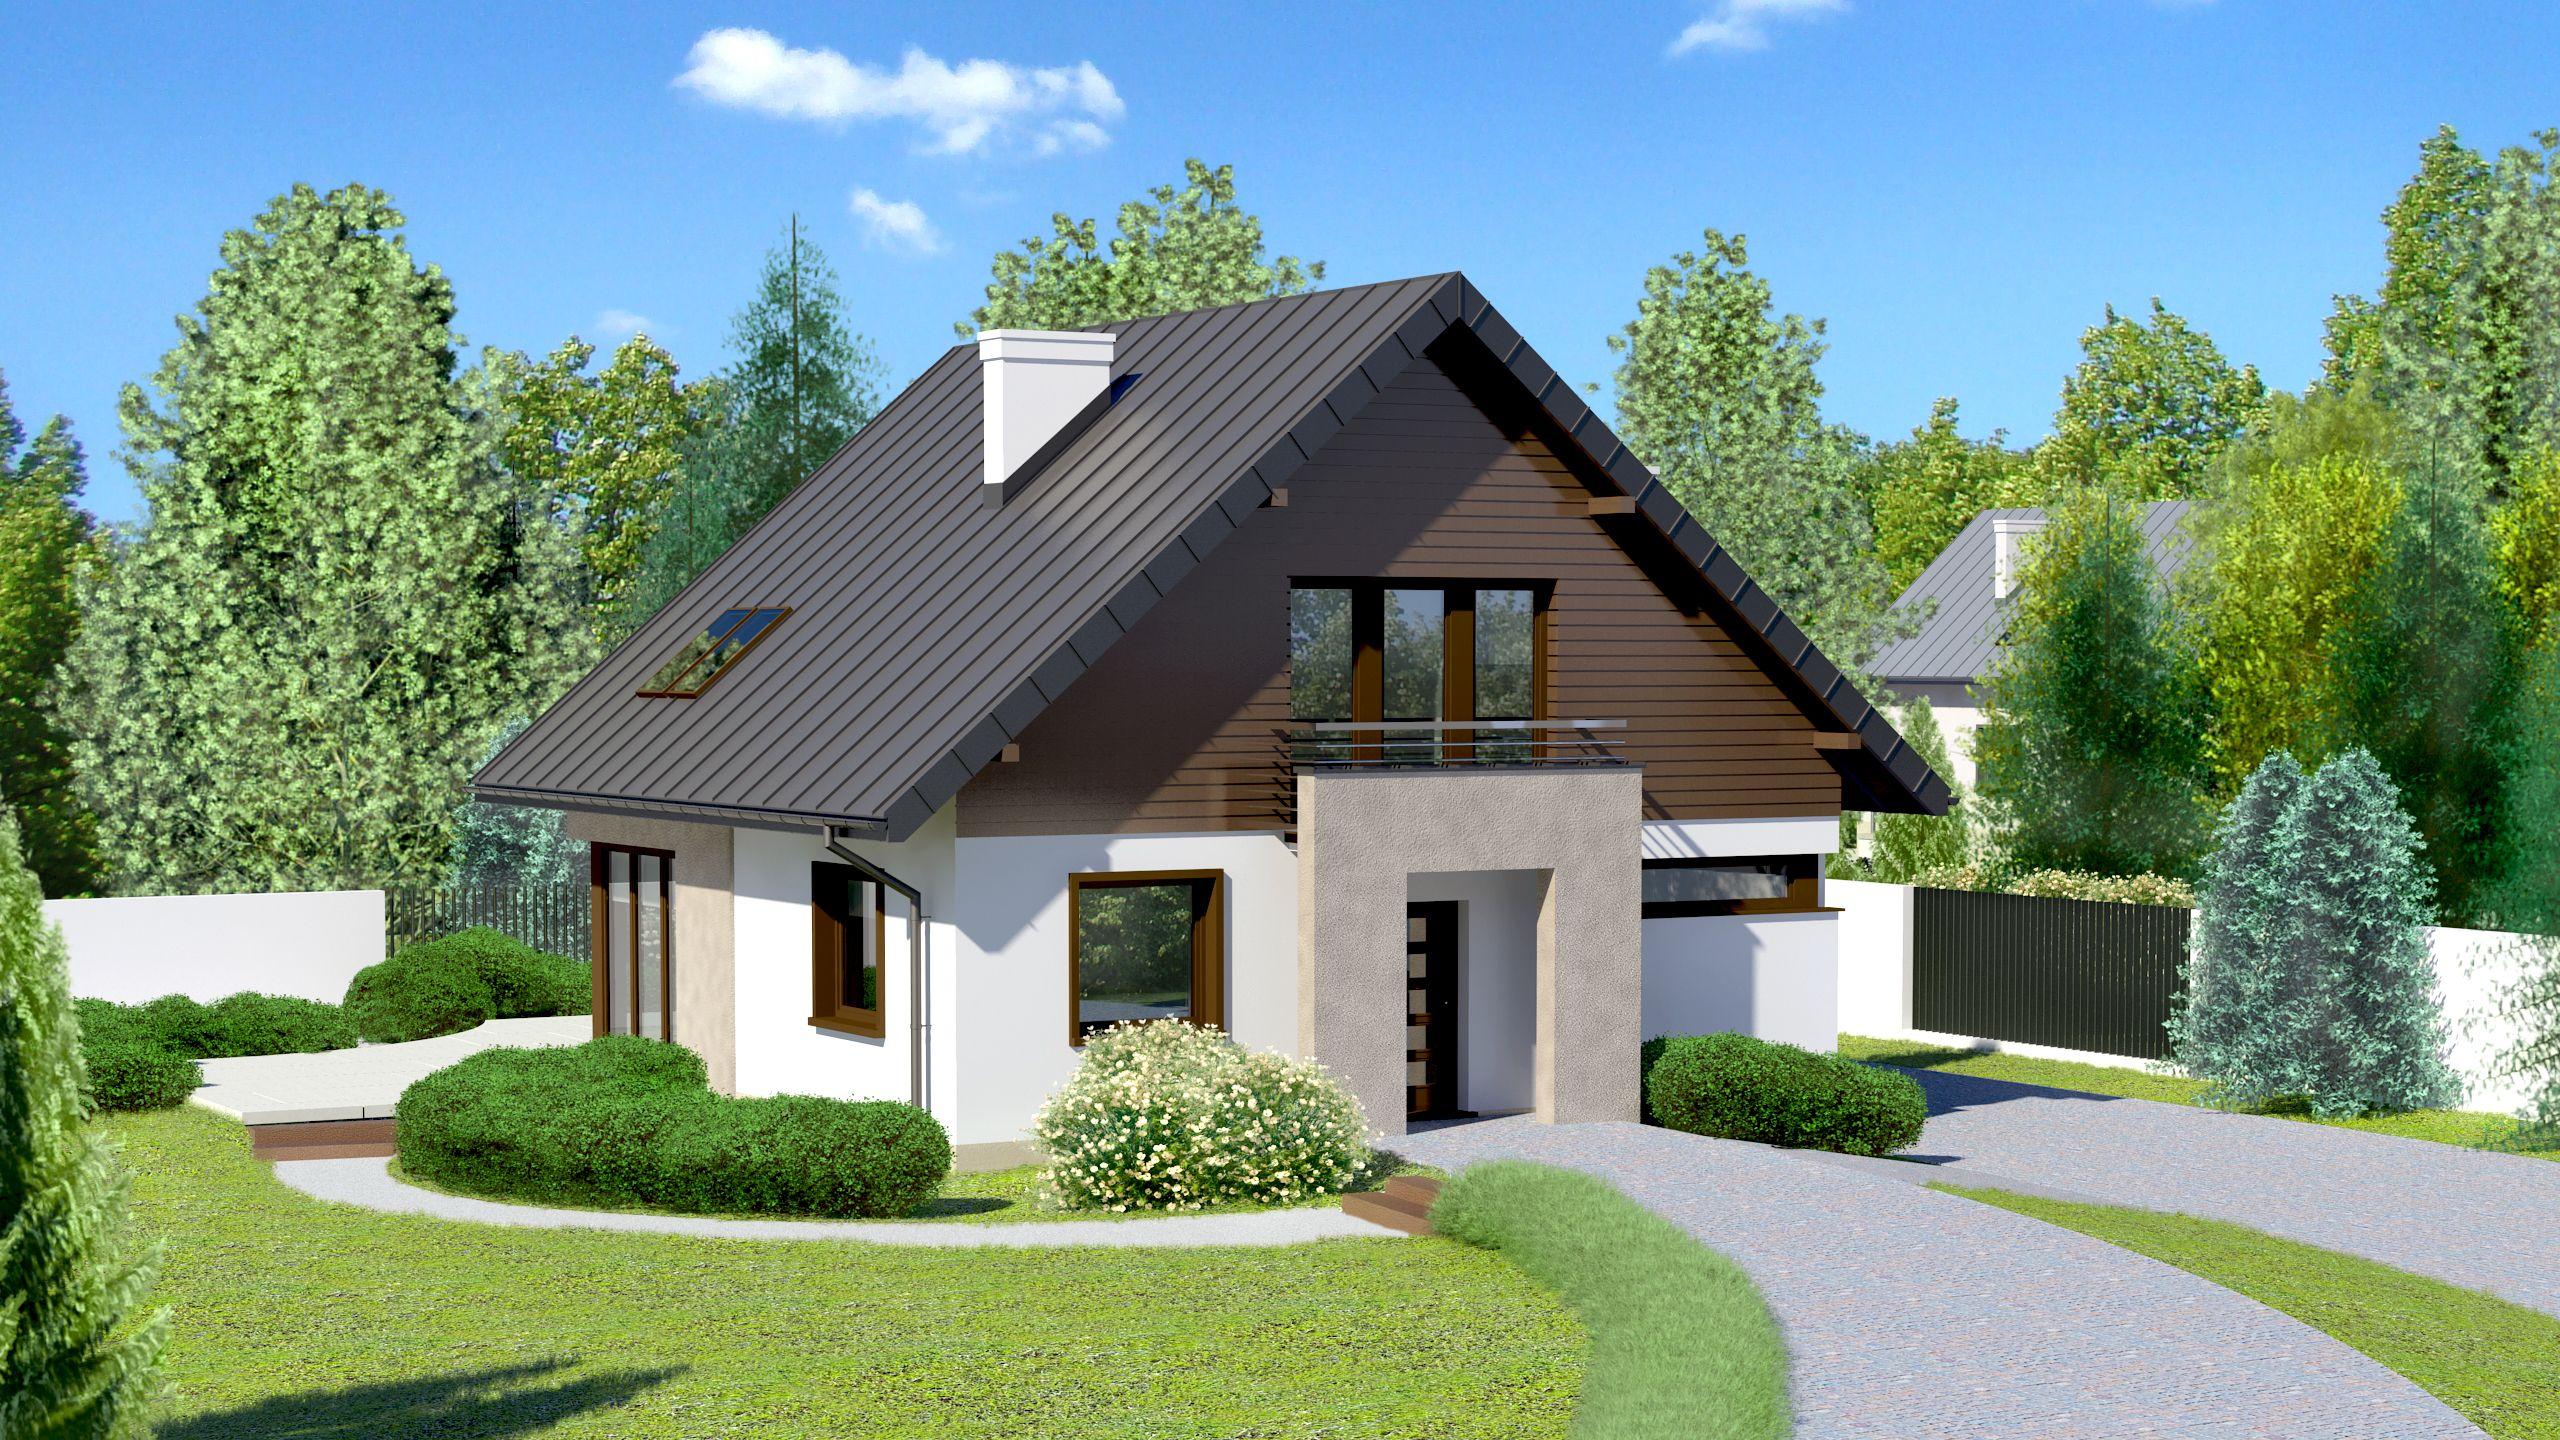 House design House at Cyprysowa 7 CE – HOUSE EB3-15 – ready …